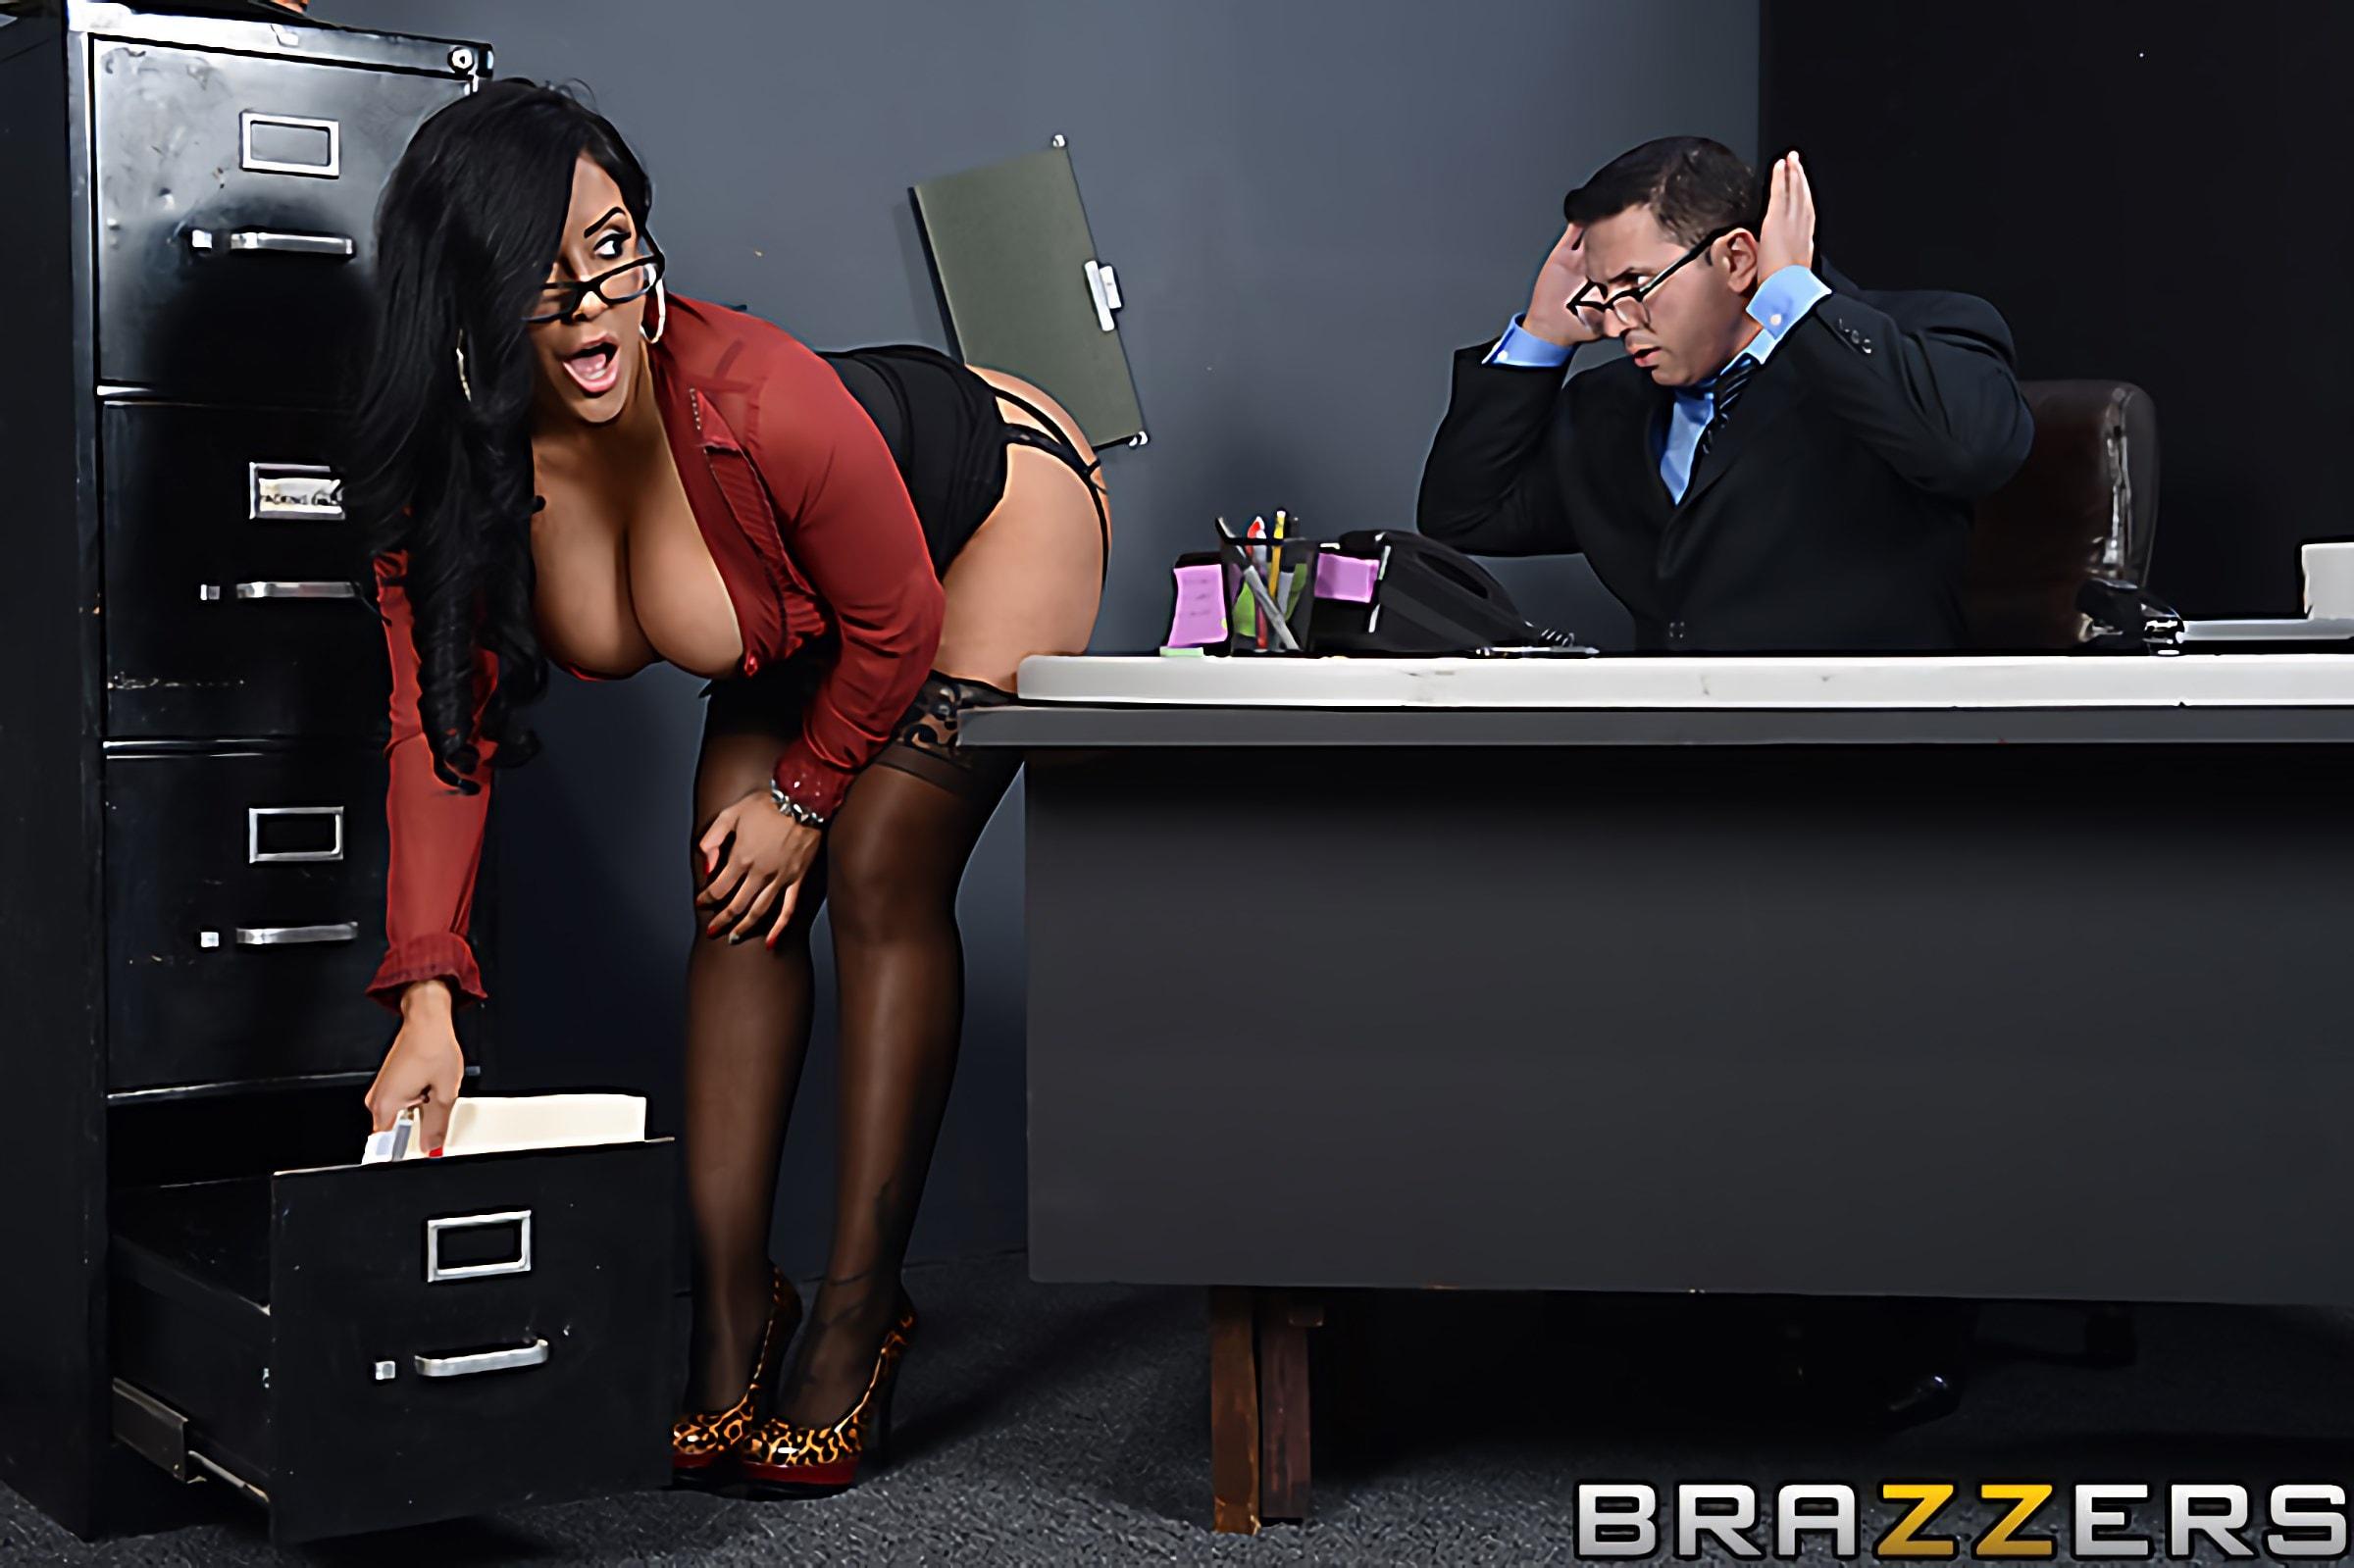 Brazzers 'My Boss Is A Creep' starring Kiara Mia (Photo 8)